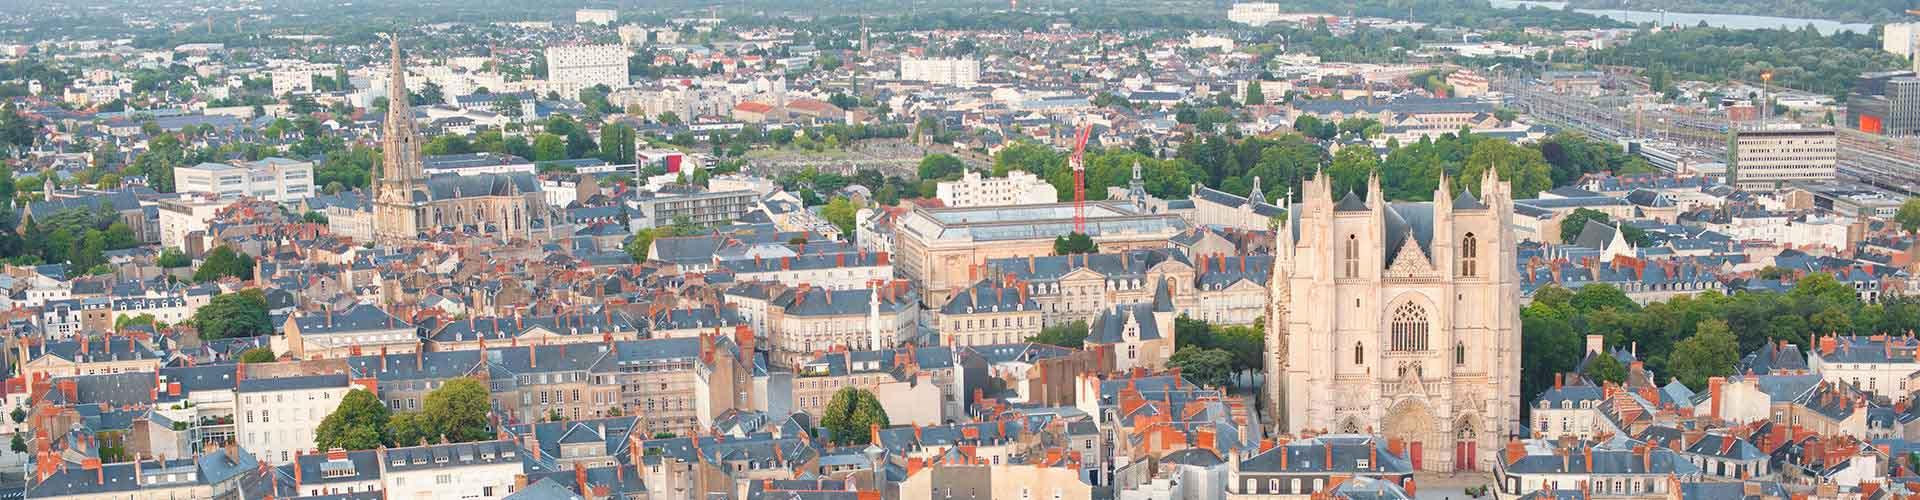 Nantes – Hostellit kaupungiosassa Route De Sainte-Luce. Nantes -karttoja, valokuvia ja arvosteluja kaikista Nantes -hostelleista.